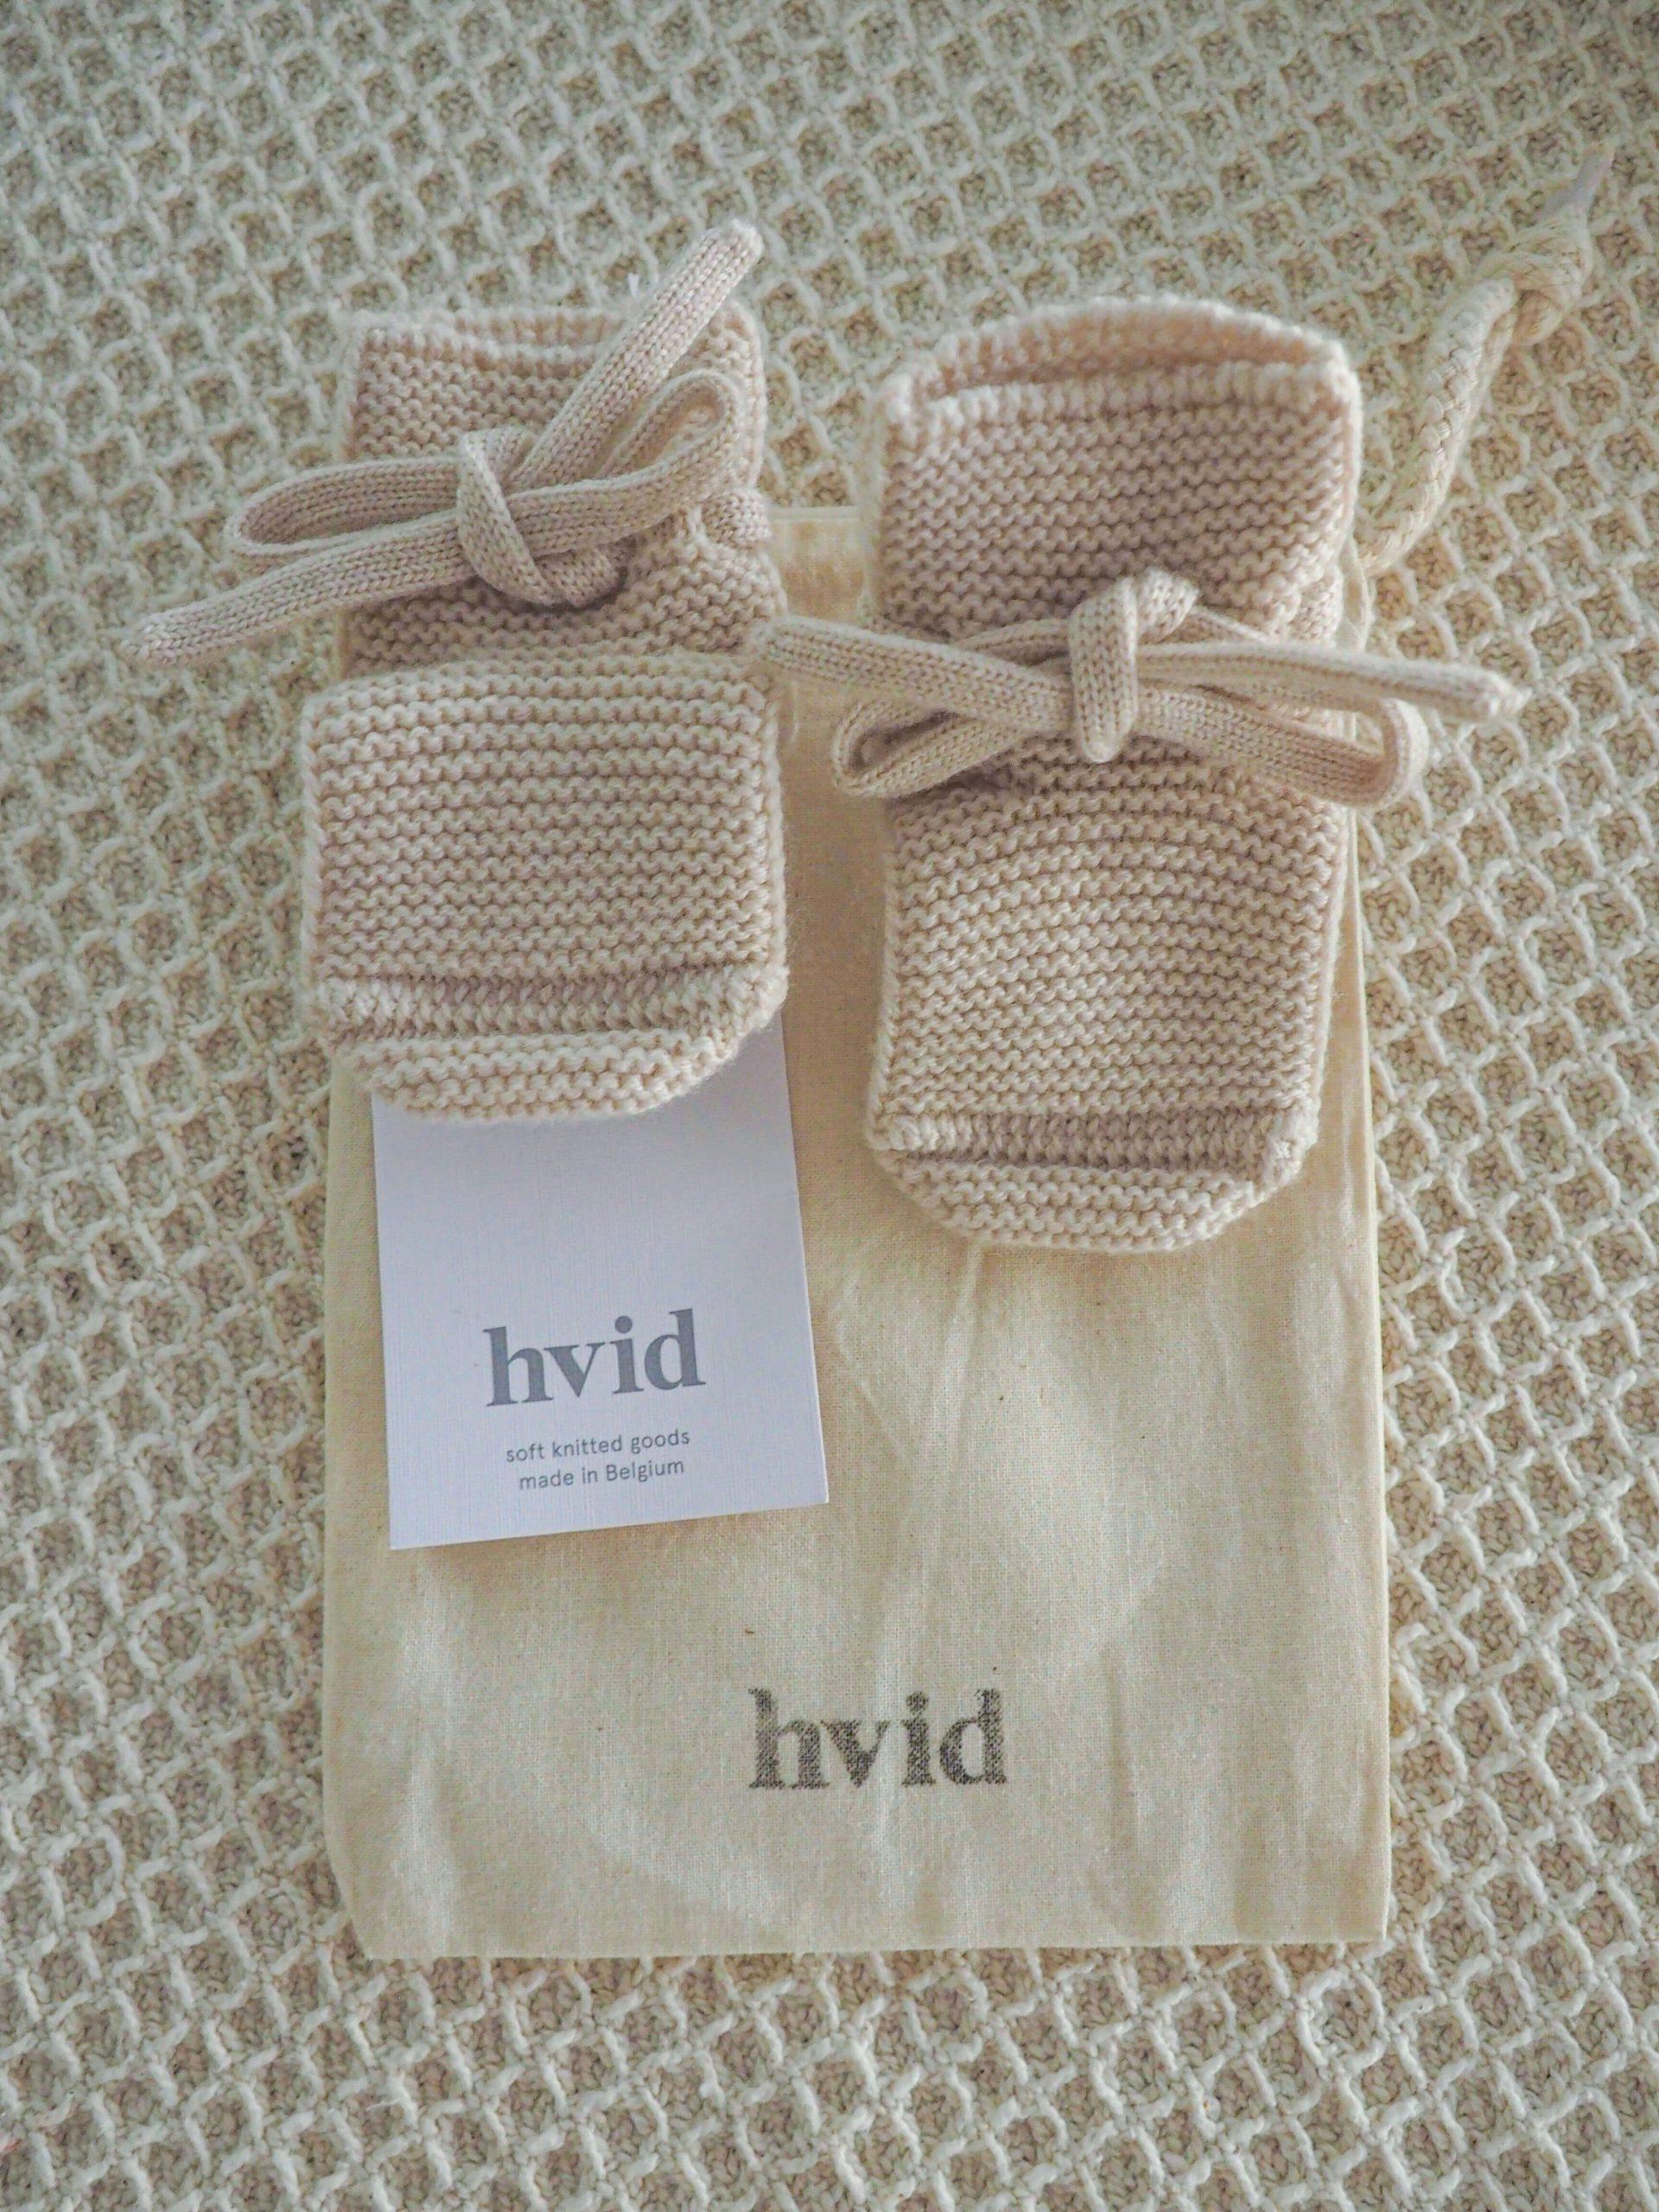 Hvid-booties-in-bag-from-Elves-in-the-Wardrobe